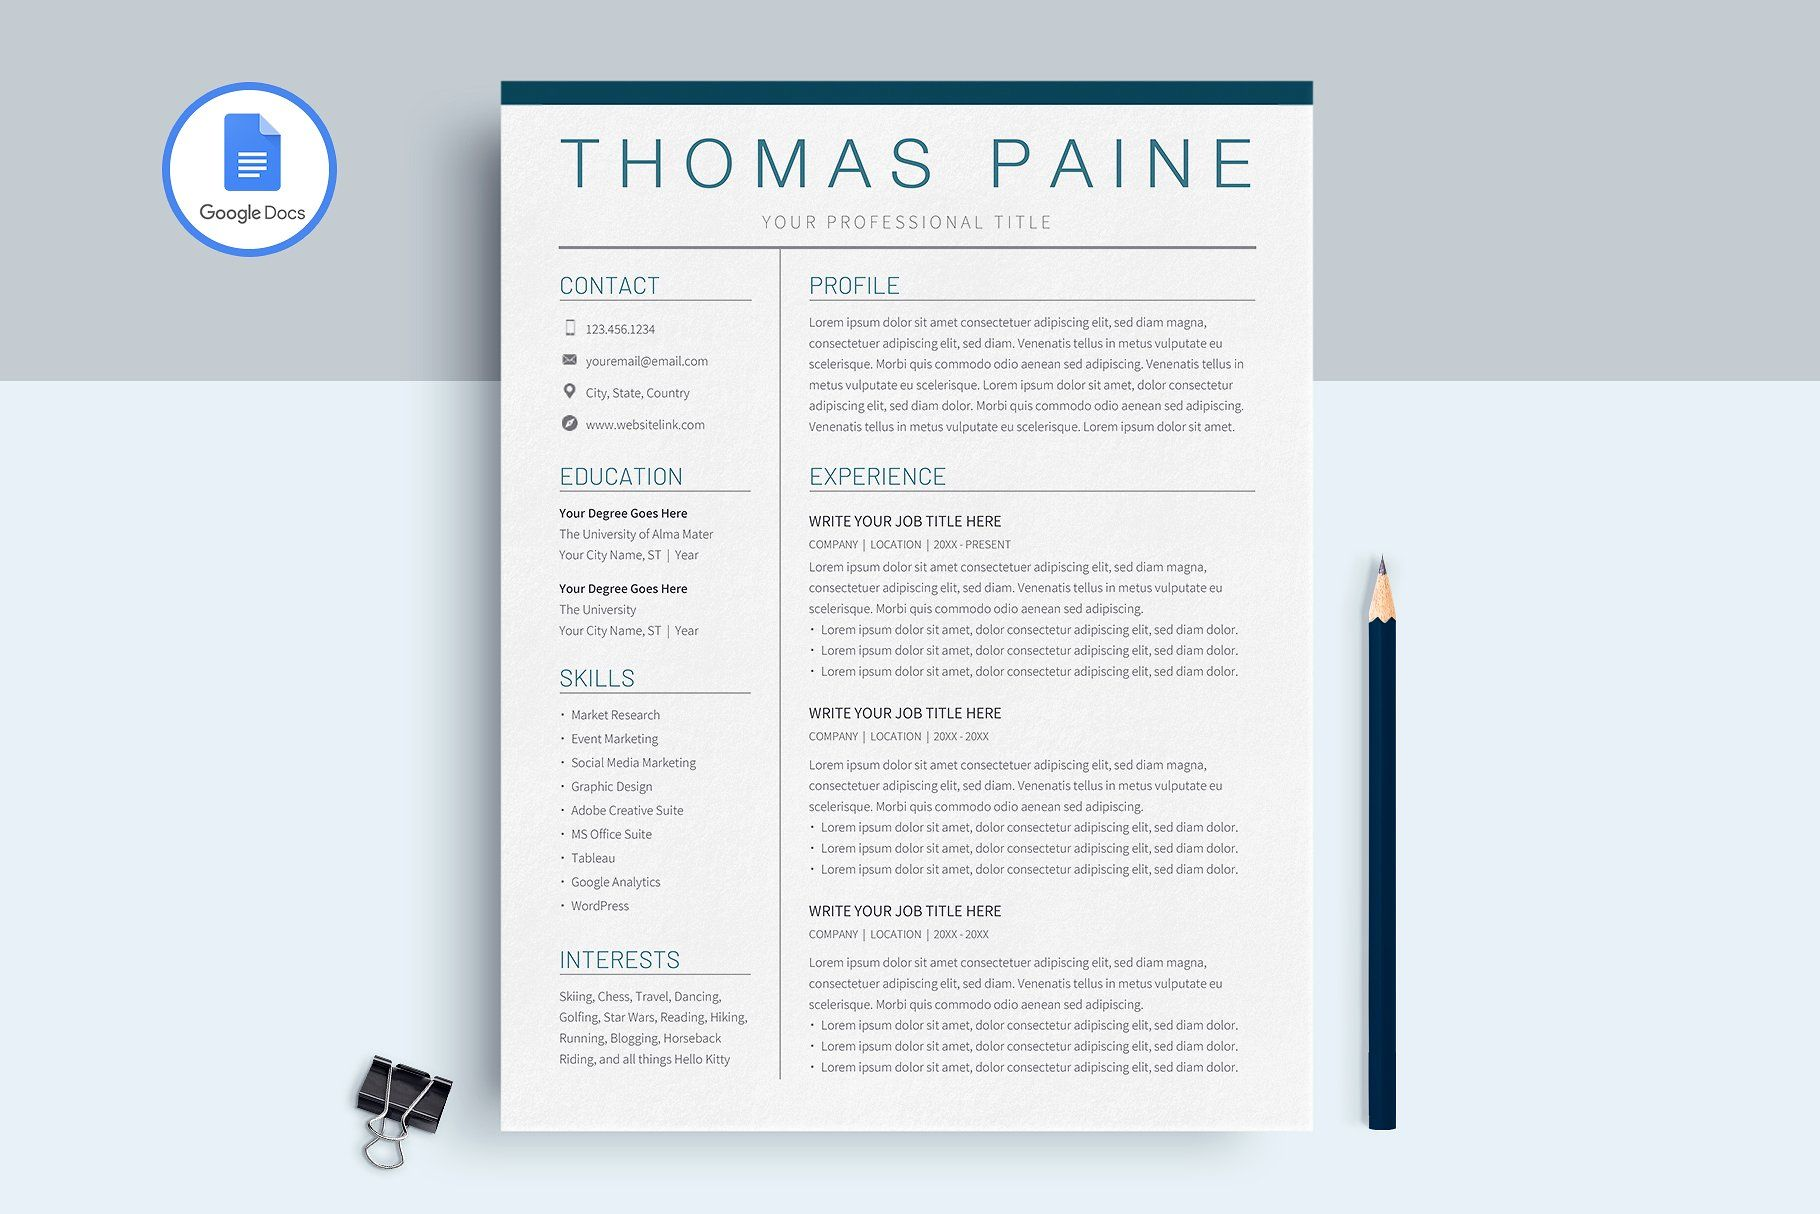 Google Docs Resume Template Resume template, Cv resume